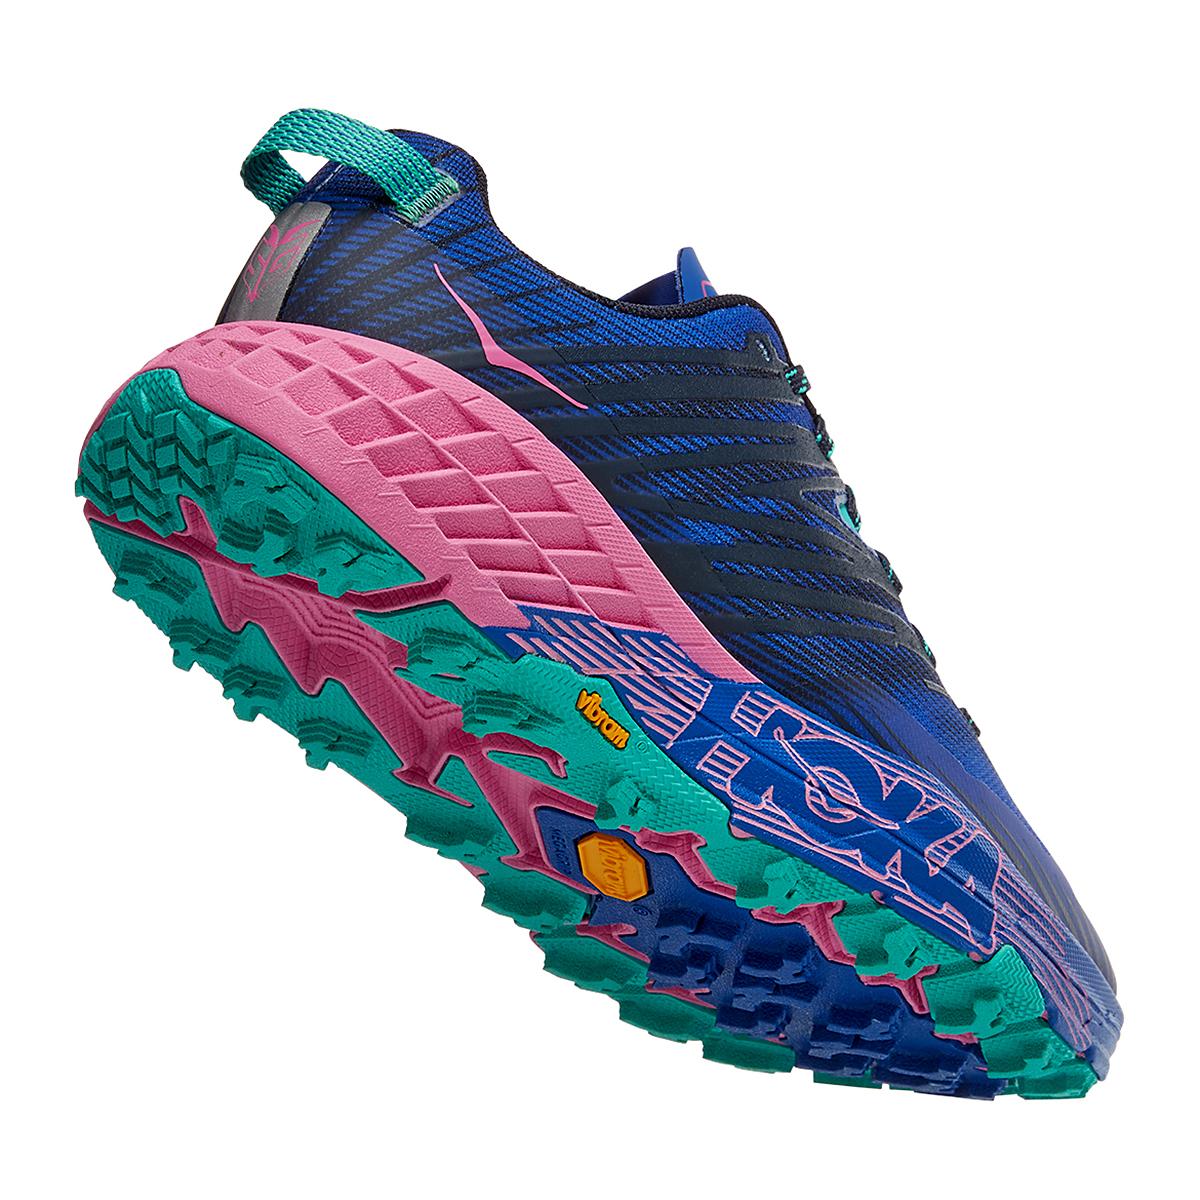 Women's Hoka One One Speedgoat 4 Trail Running Shoe - Color: Dazzling Blue/Phlox Pink - Size: 6 - Width: Regular, Dazzling Blue/Phlox Pink, large, image 4